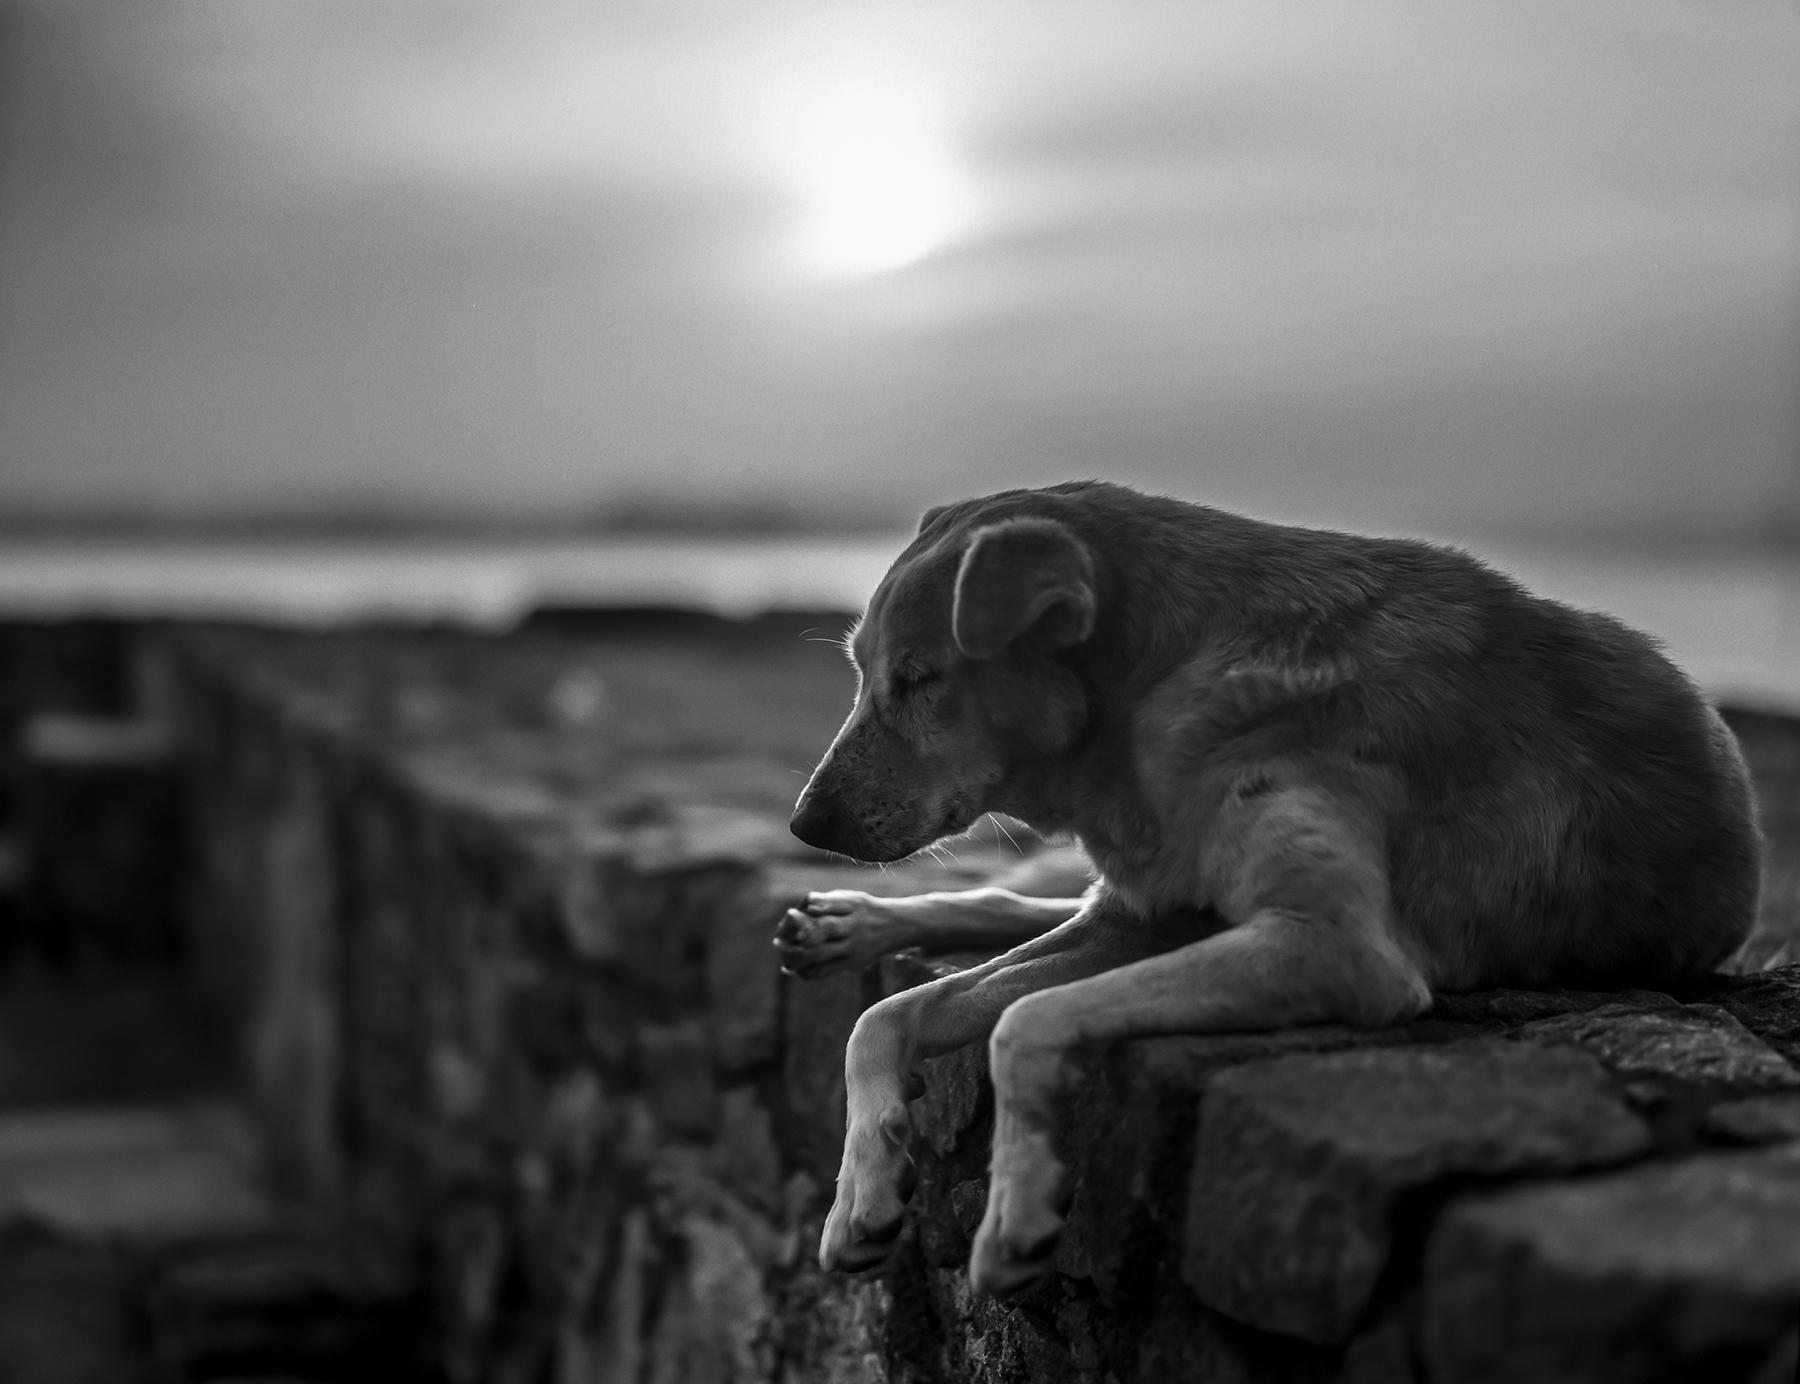 Sleepy Dawn #4 by Roger-Wilco-66